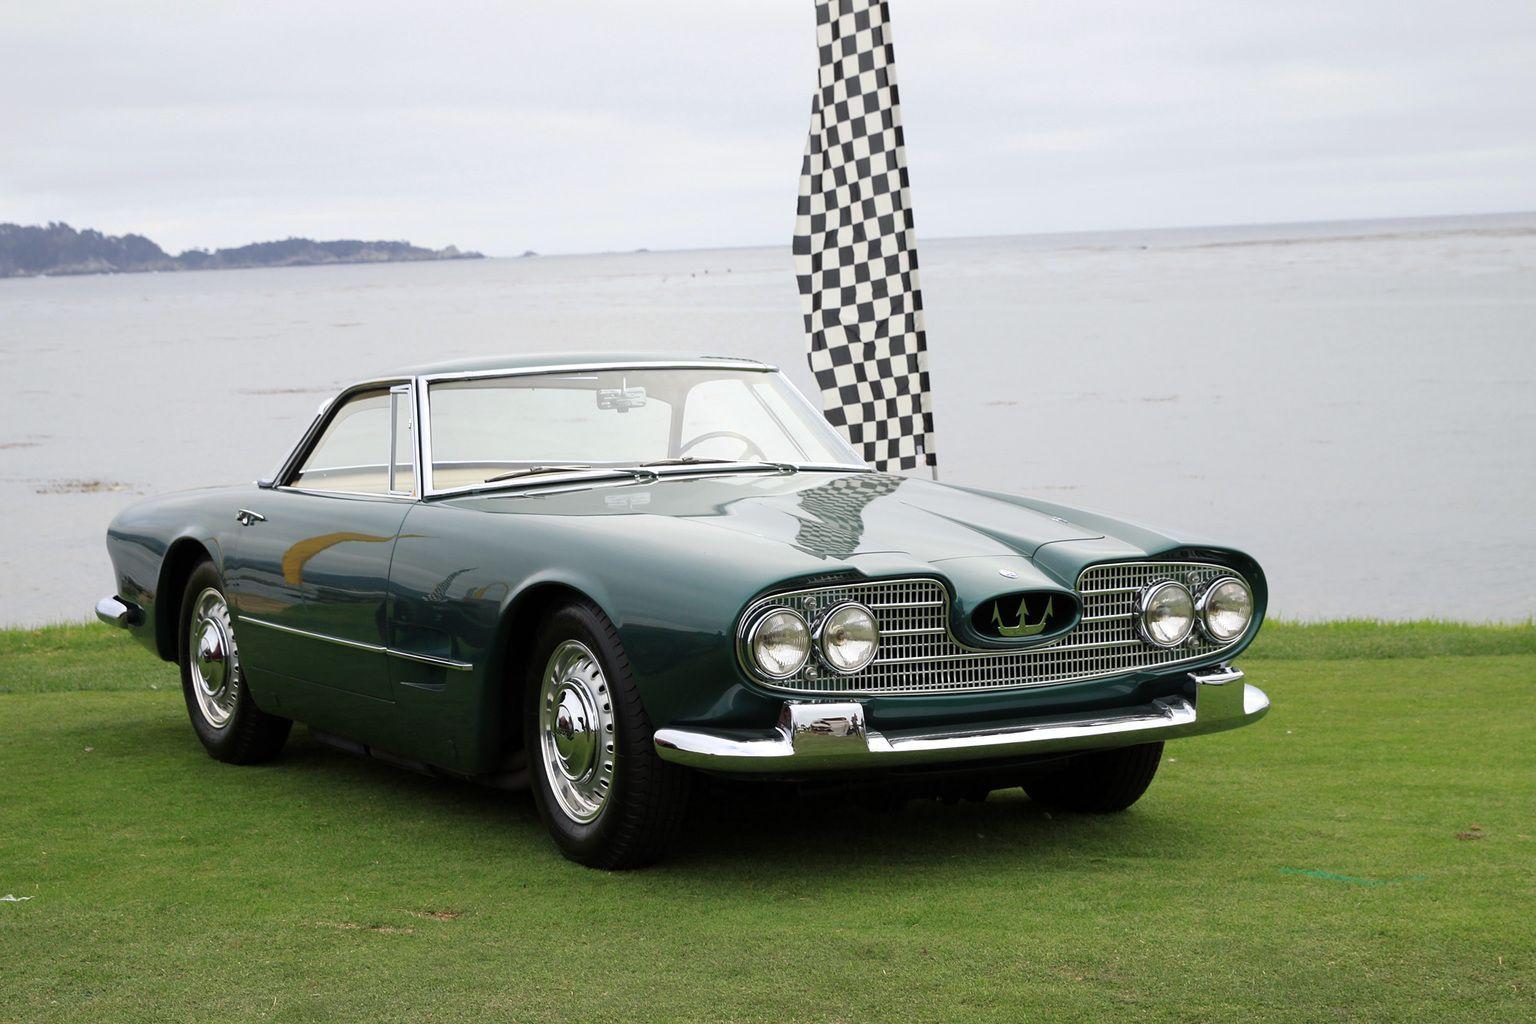 1959 maserati 5000 gt touring (s/n am103-004) | maserati classic